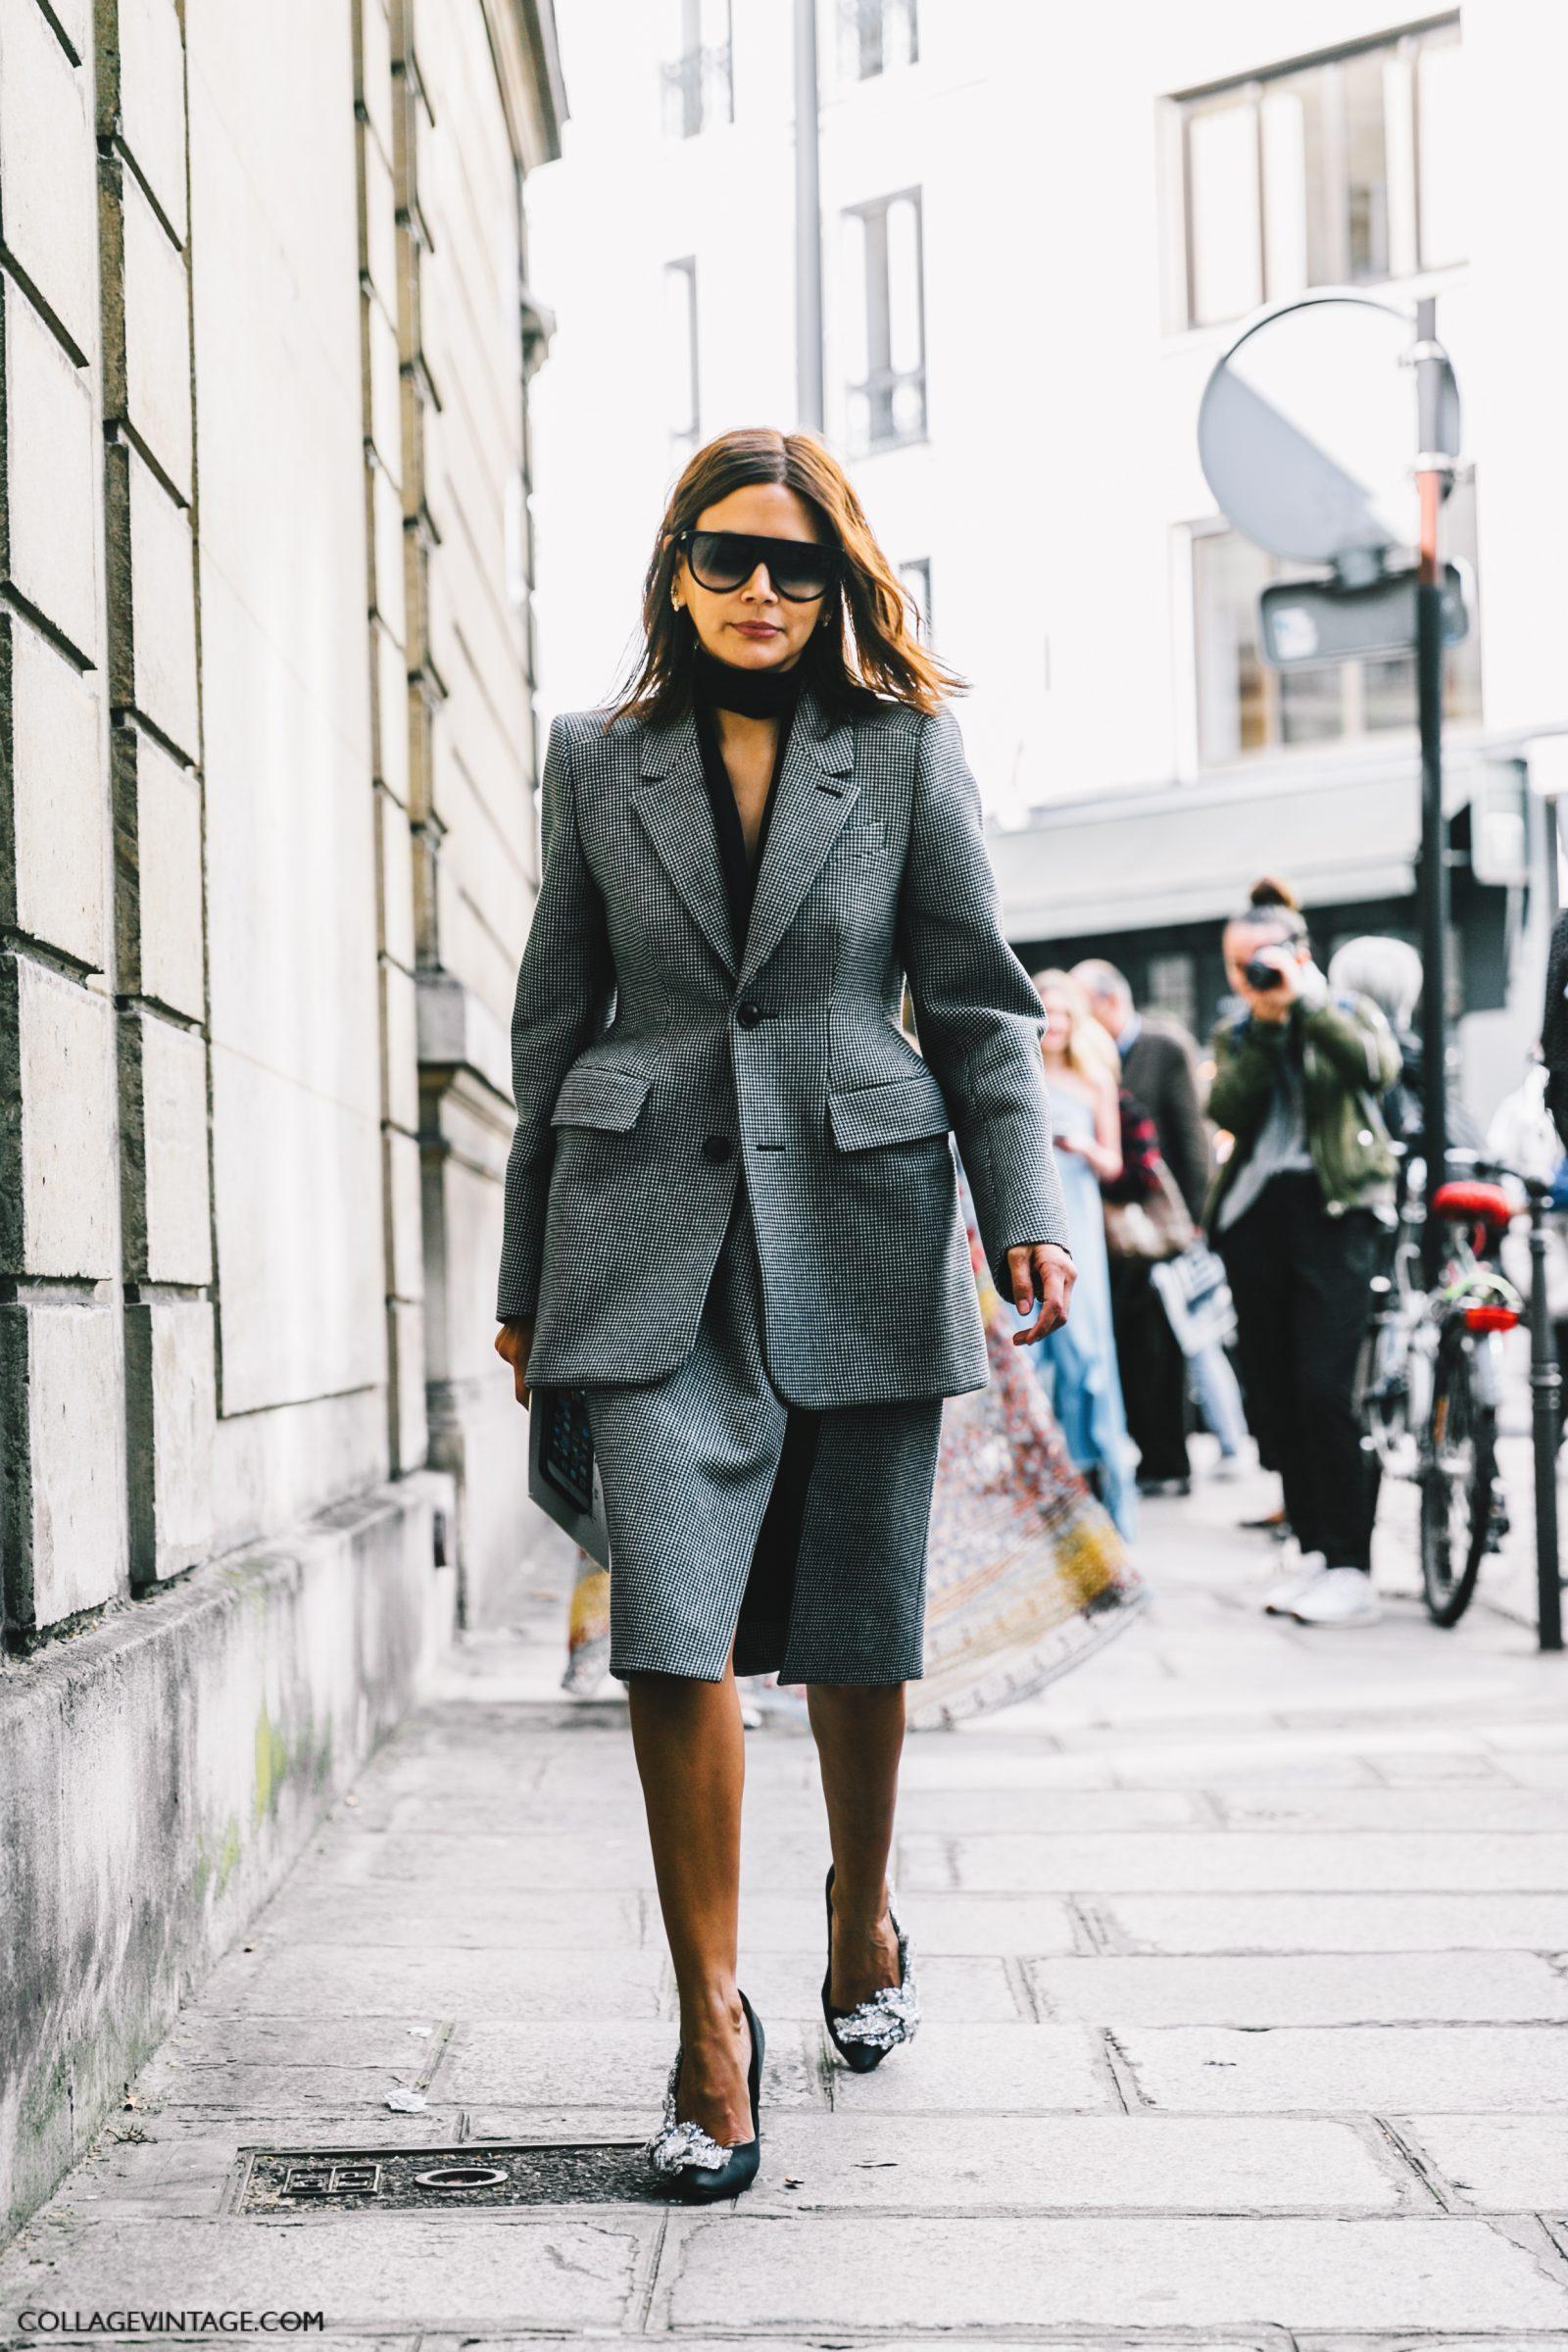 pfw-paris_fashion_week_ss17-street_style-outfits-collage_vintage-valentino-balenciaga-celine-116